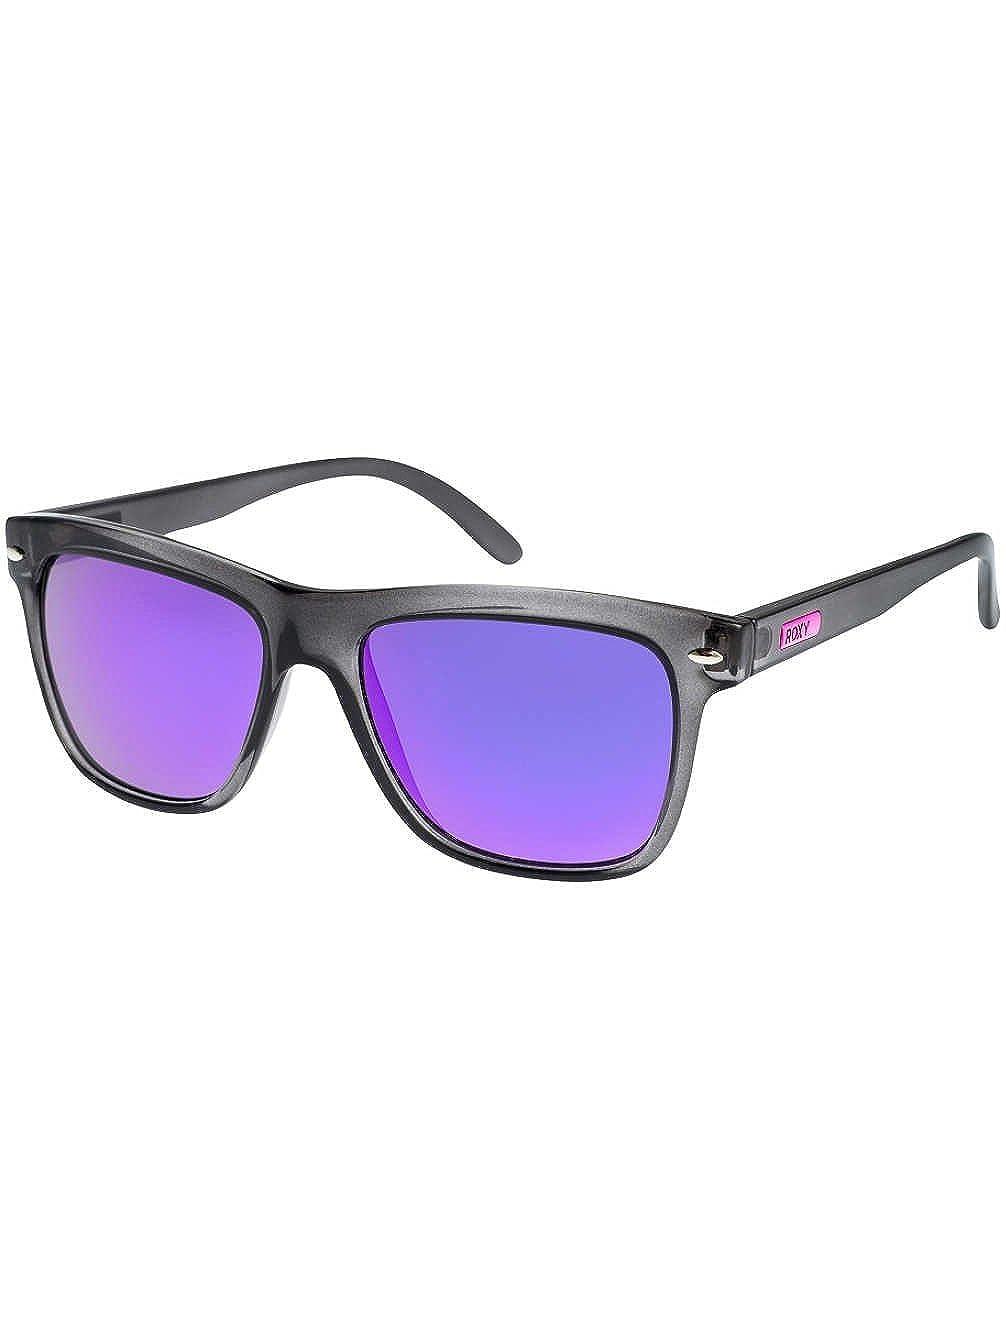 Roxy Miller - Sunglasses - Gafas de sol - Mujer - ONE SIZE ...